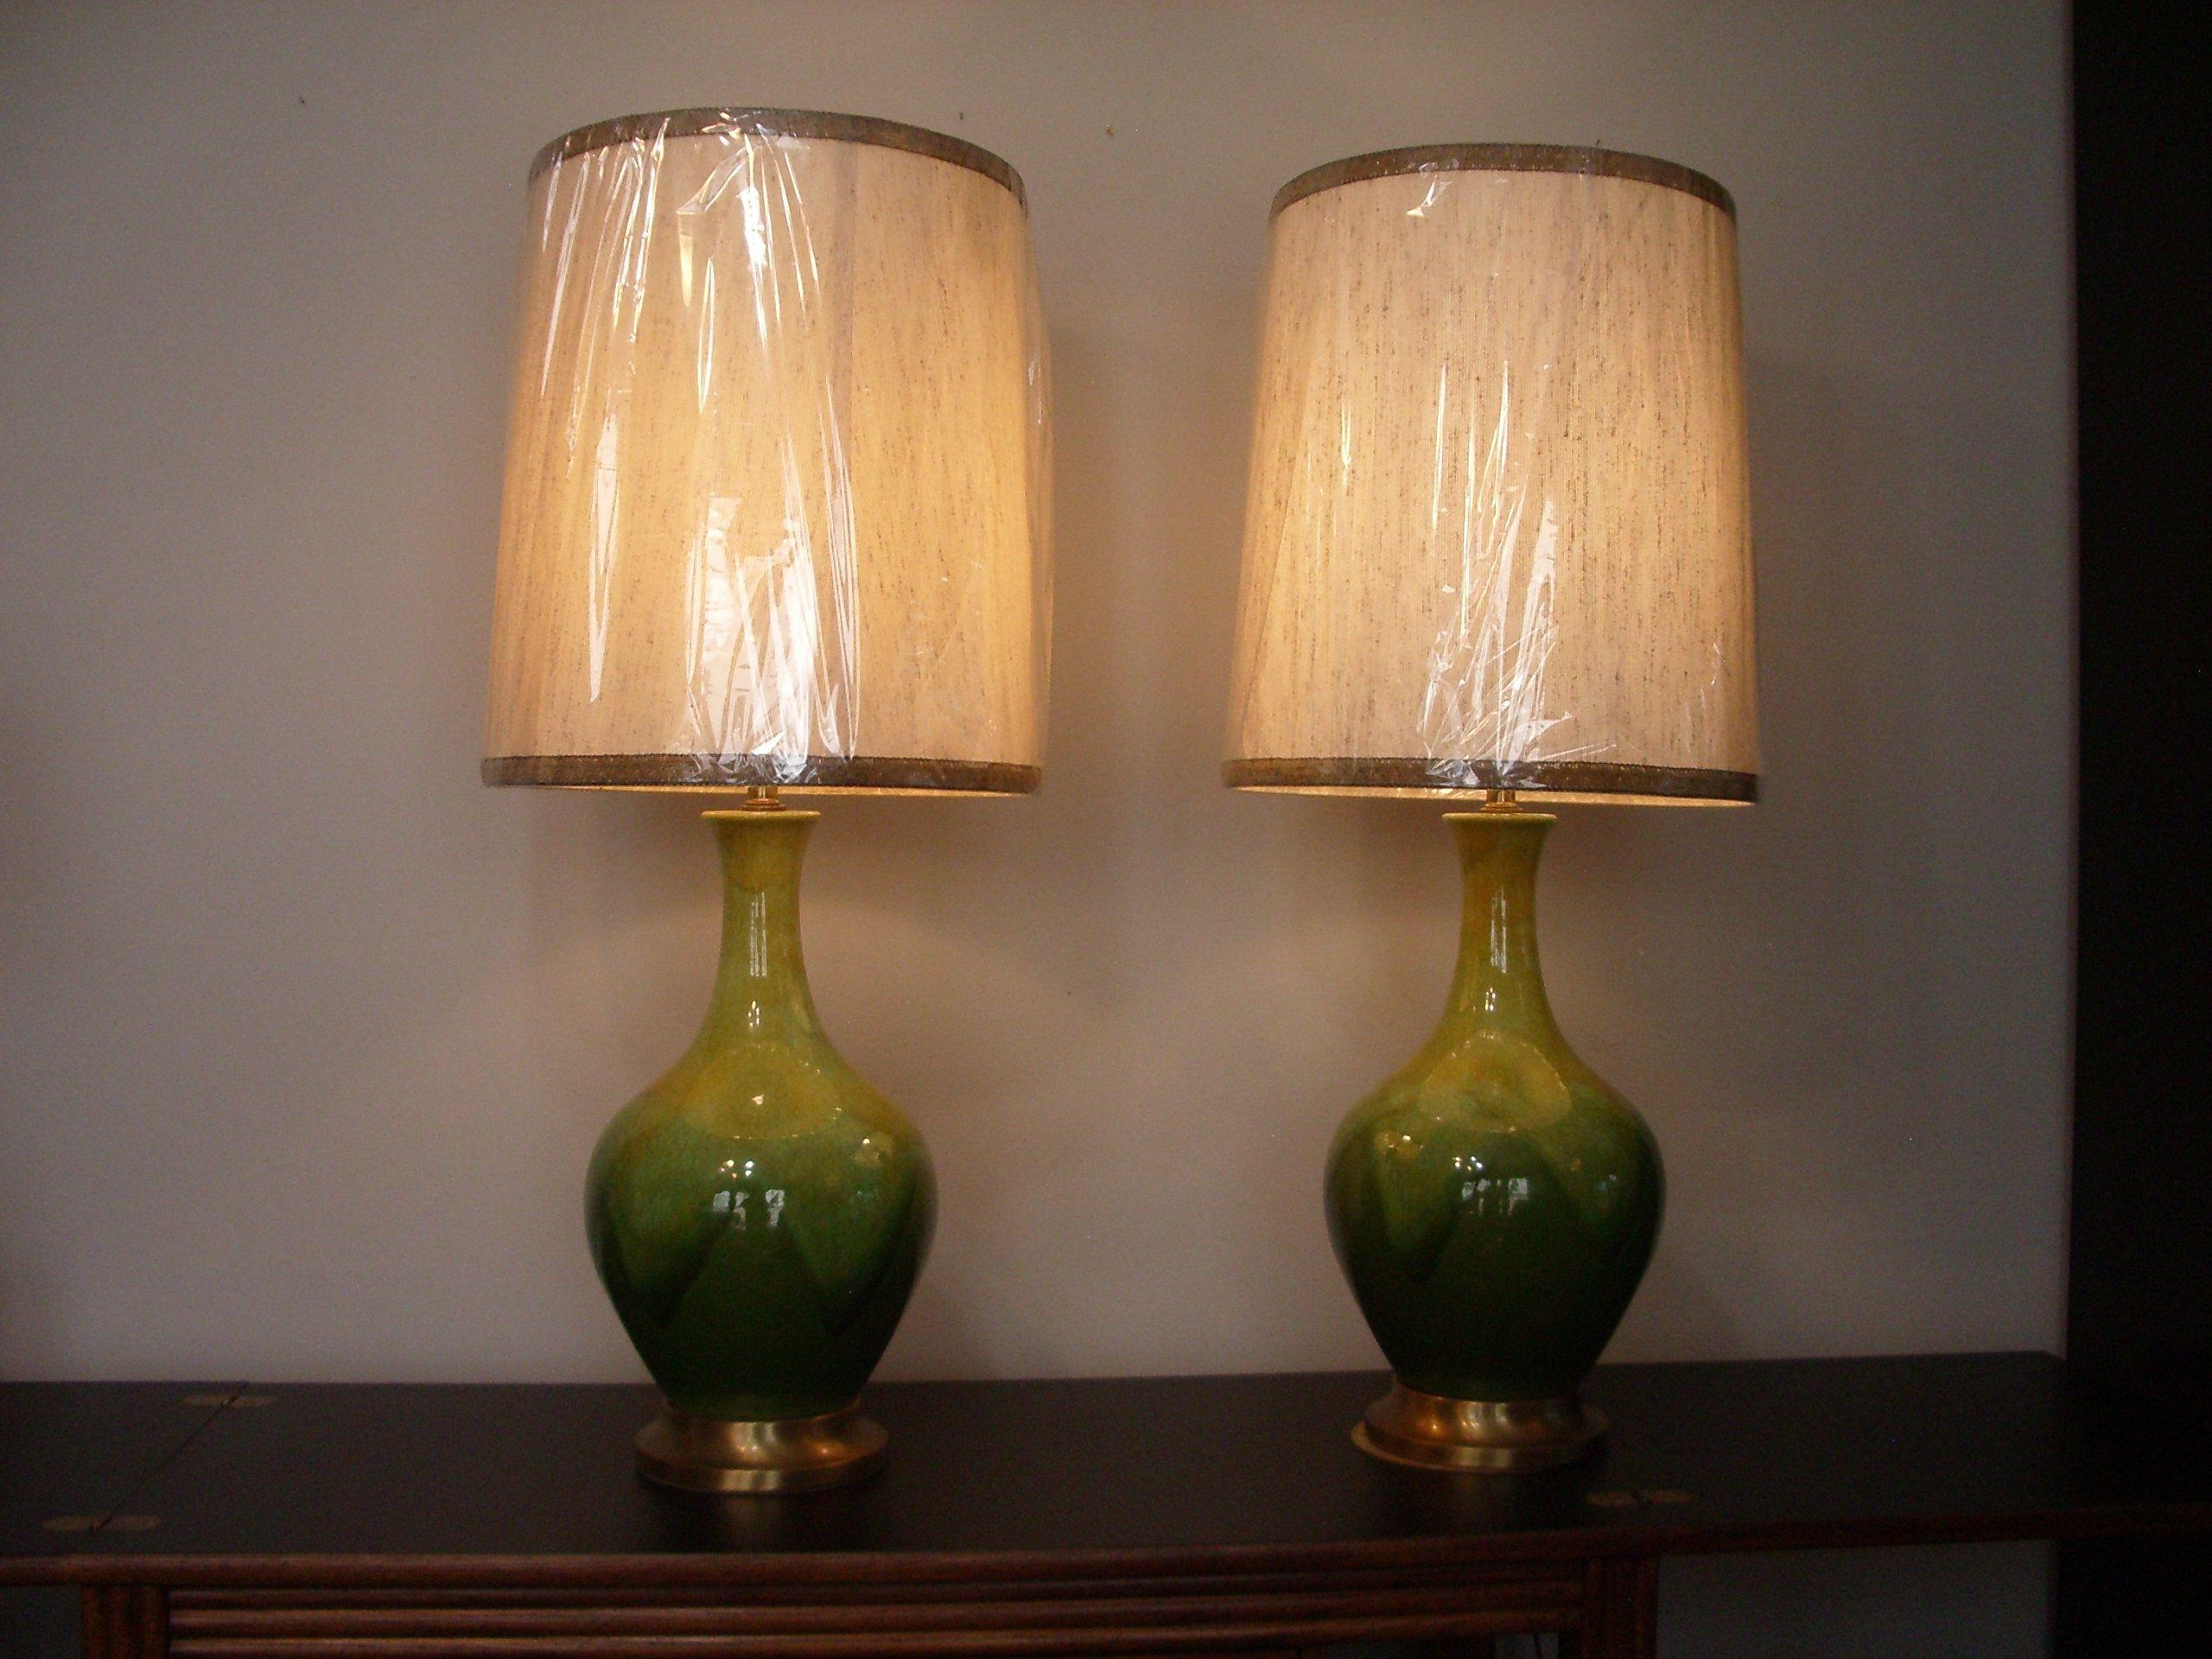 976 Haeger Ceramic Lamps Green Drip Glaze Original Shades Royal Hickman Designed Https Etsy Me 2secdwc Midcenturylighting M Lamp Vintage Lamps Ceramic Lamp